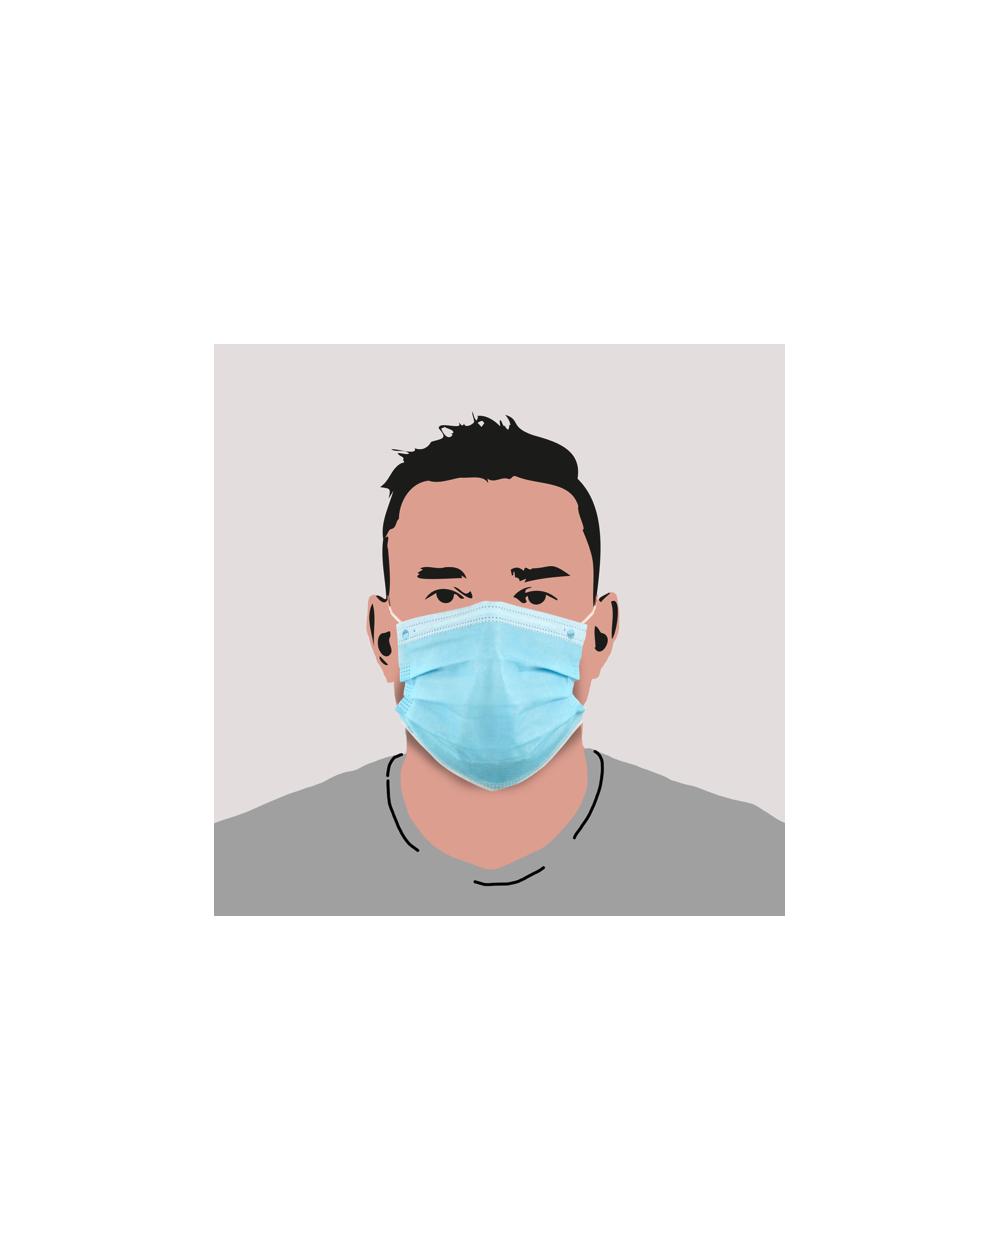 Masque de protection usage médical certifié